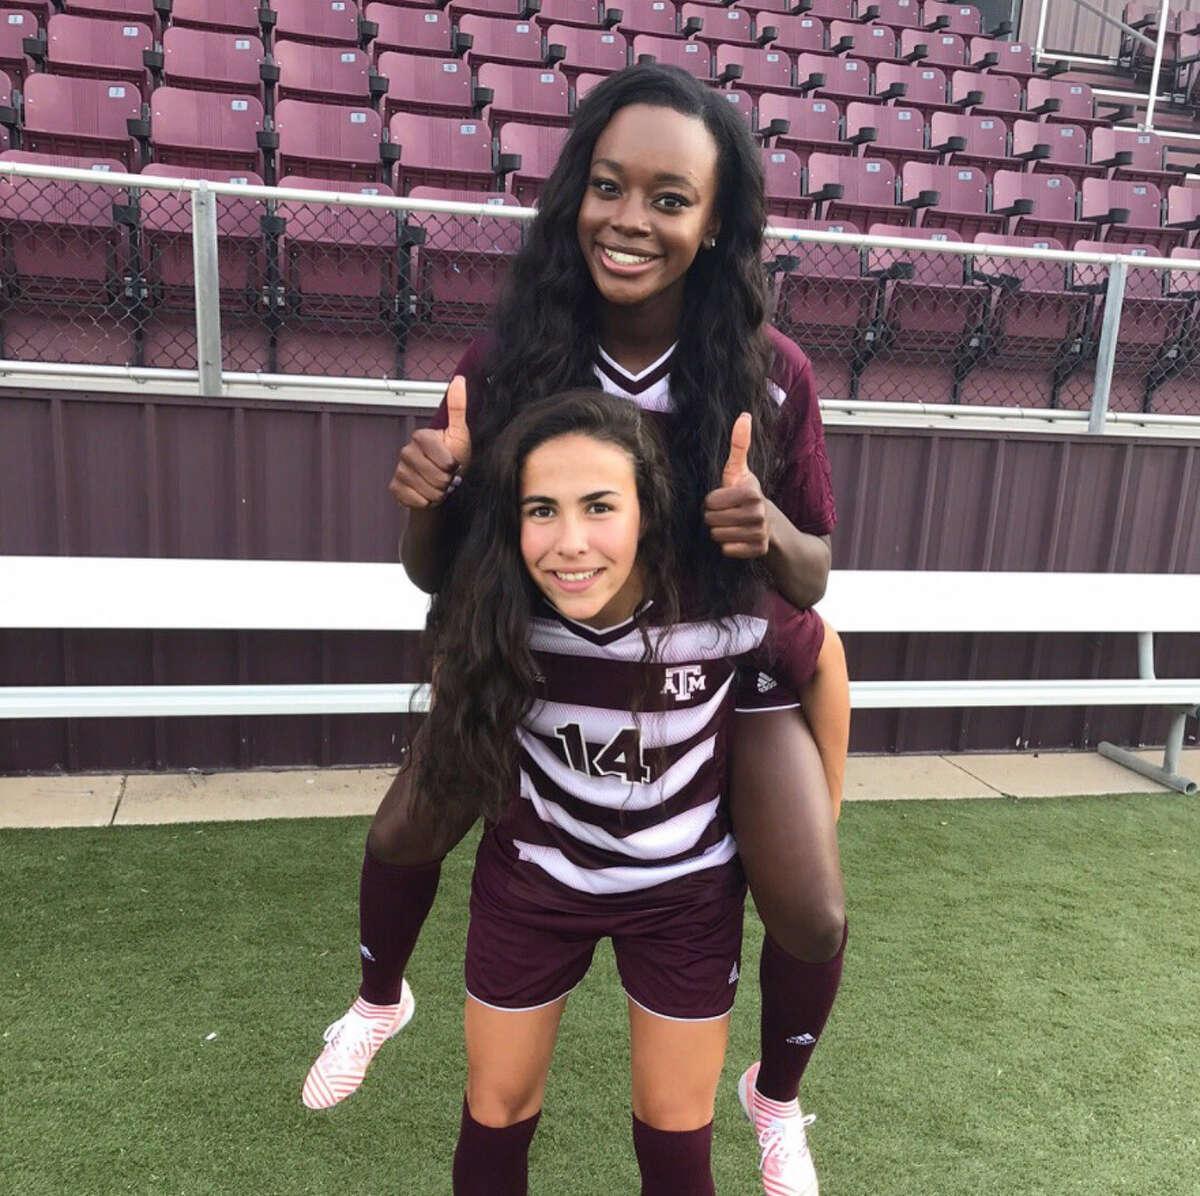 Rheagen Smith, Emmitt Smith's daughter, is a freshman on the Texas A&M soccer team.